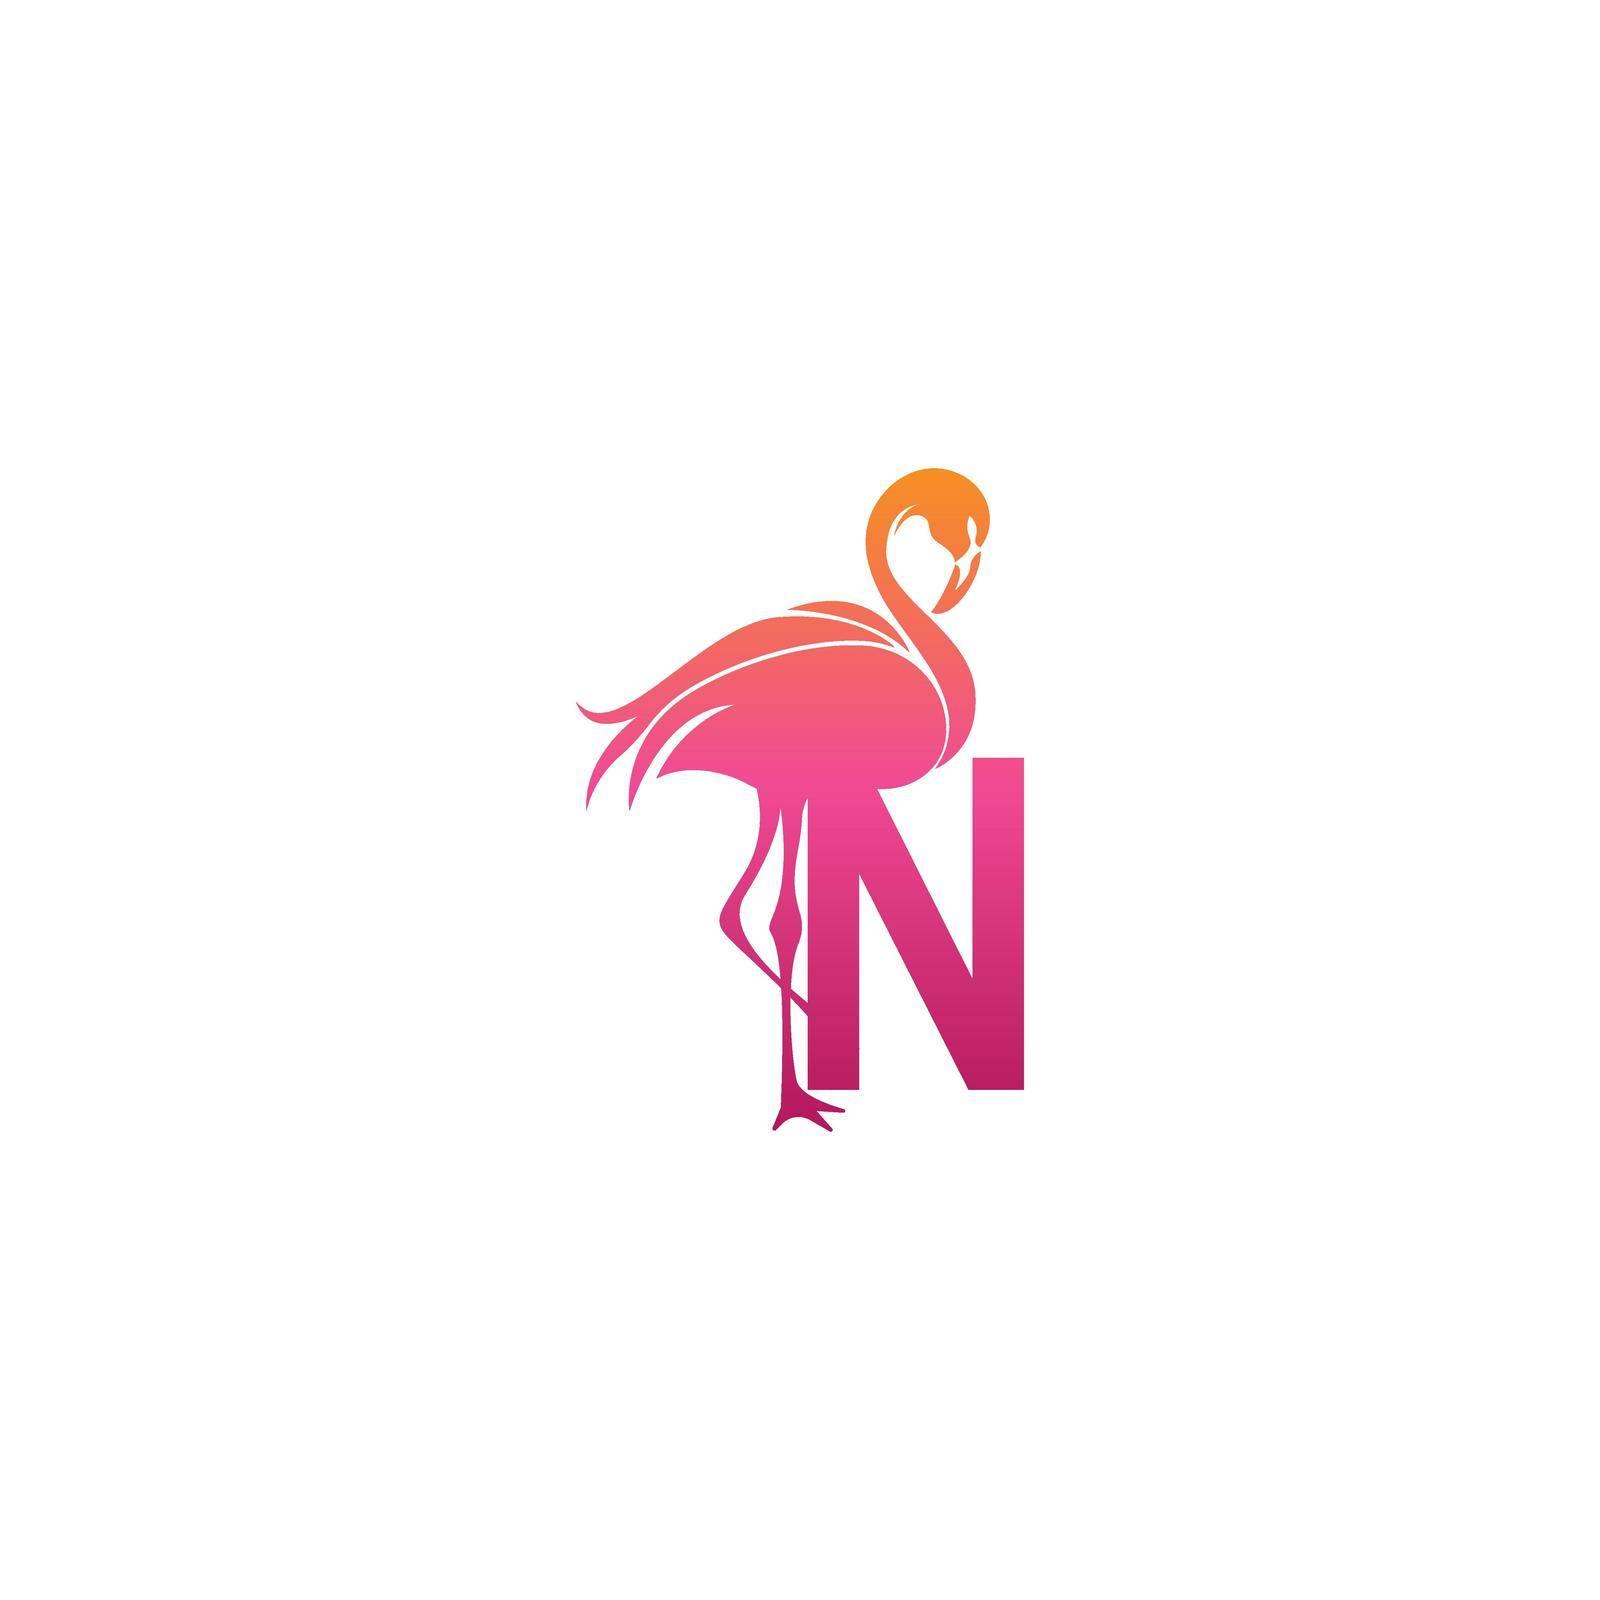 Flamingo bird icon with letter N Logo design vector template